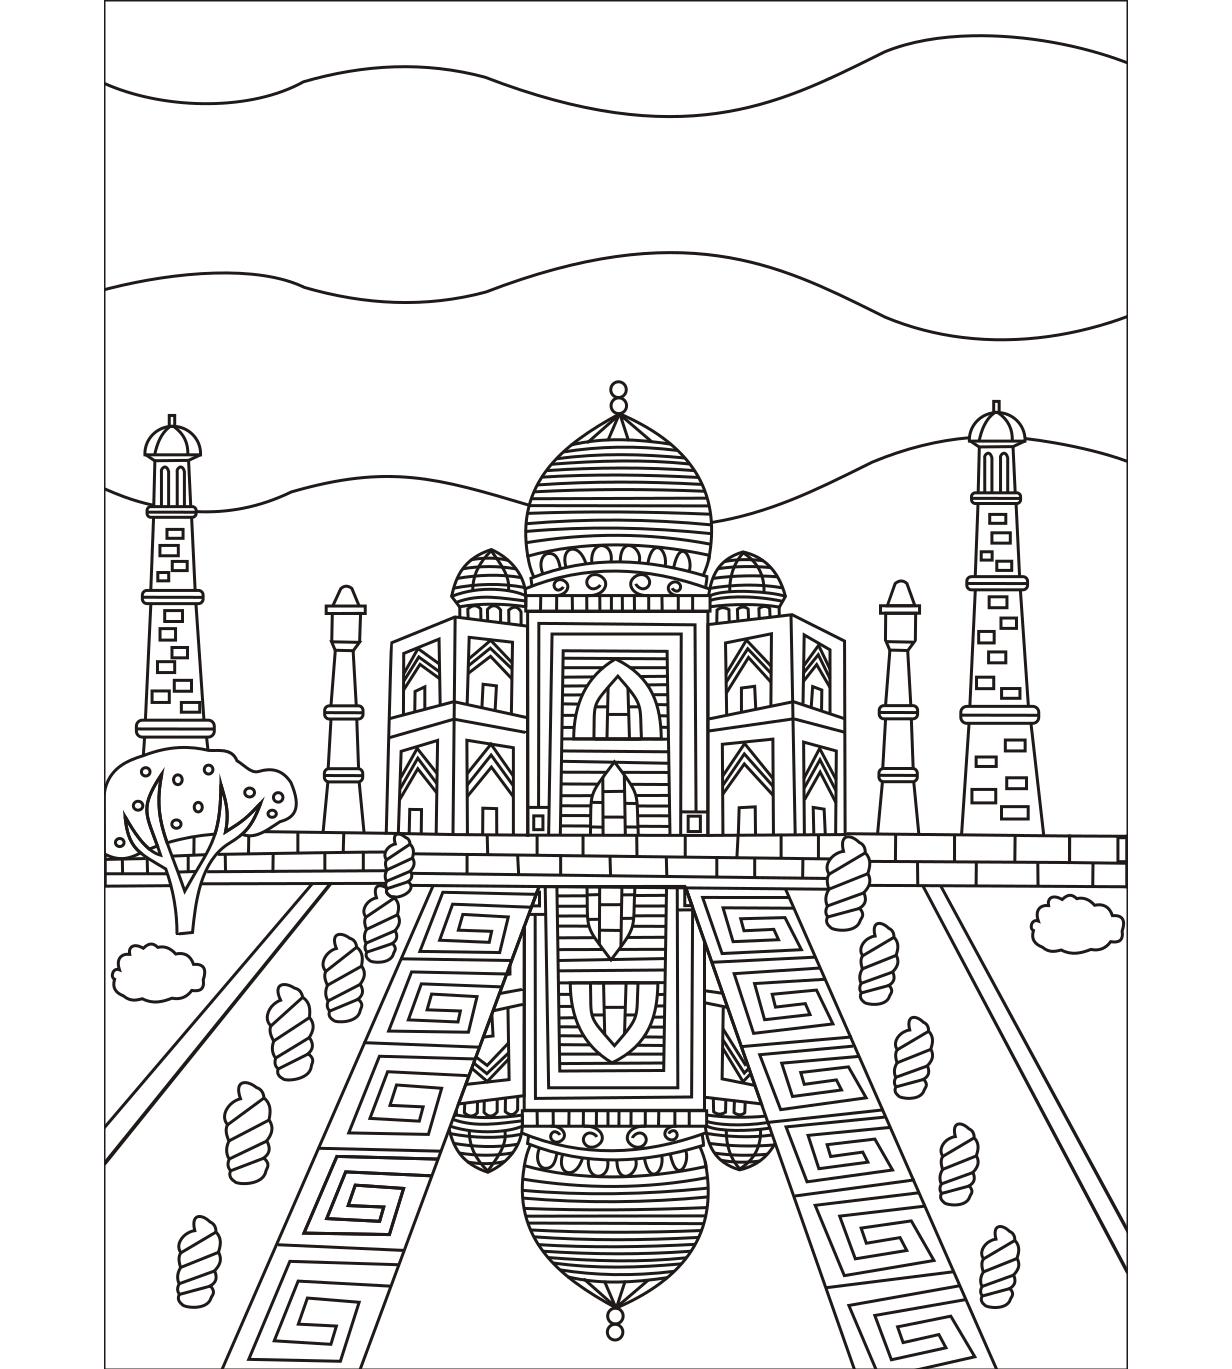 Taj Mahal #coloringpage | Colorish: coloring book for adults by ...